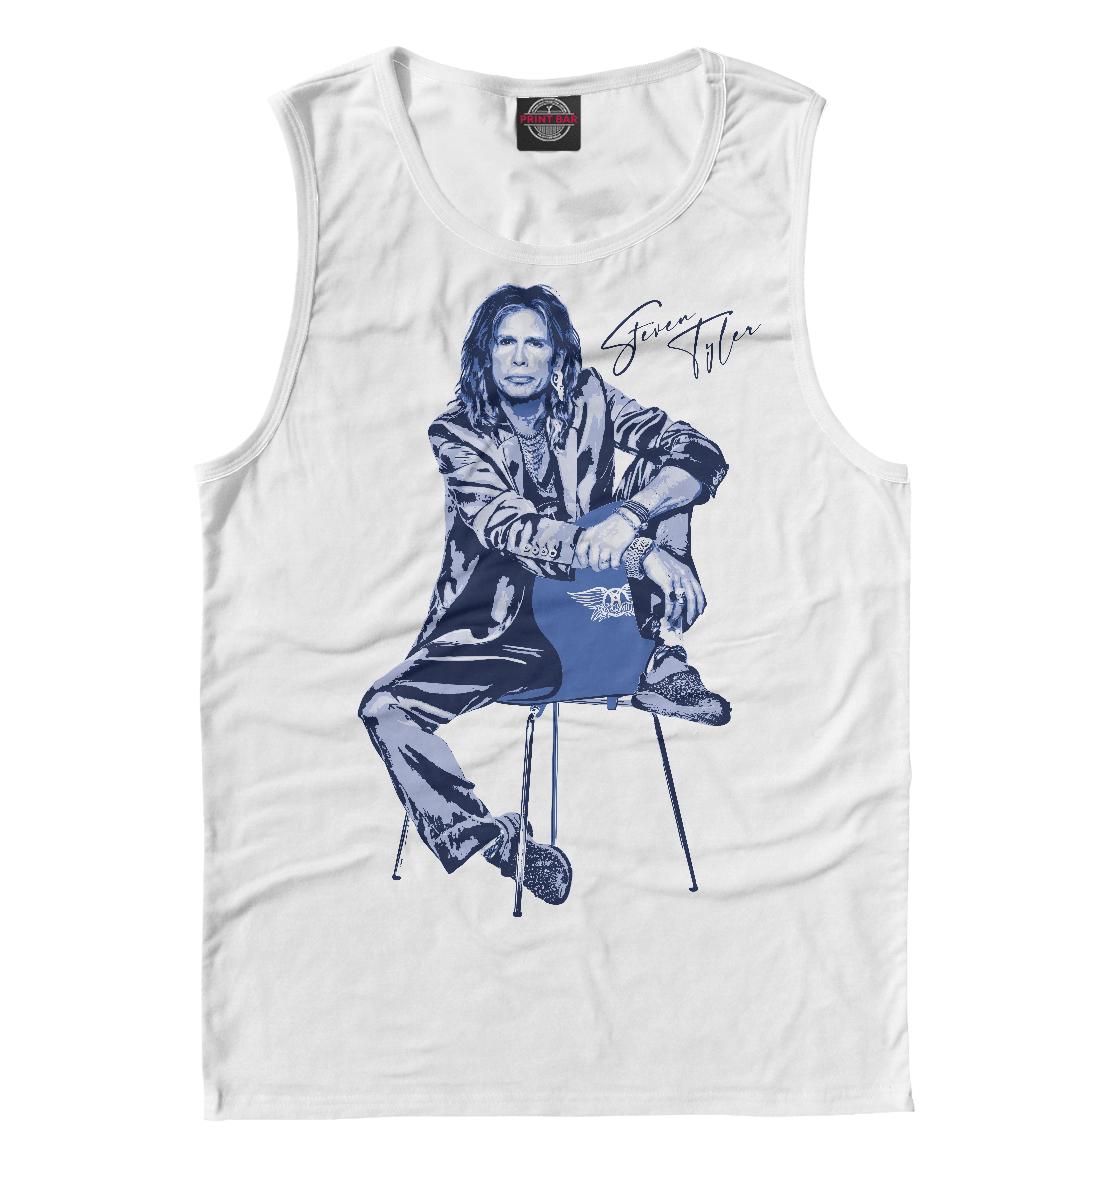 Aerosmith / Steven Tyler футболка мужская steven alan